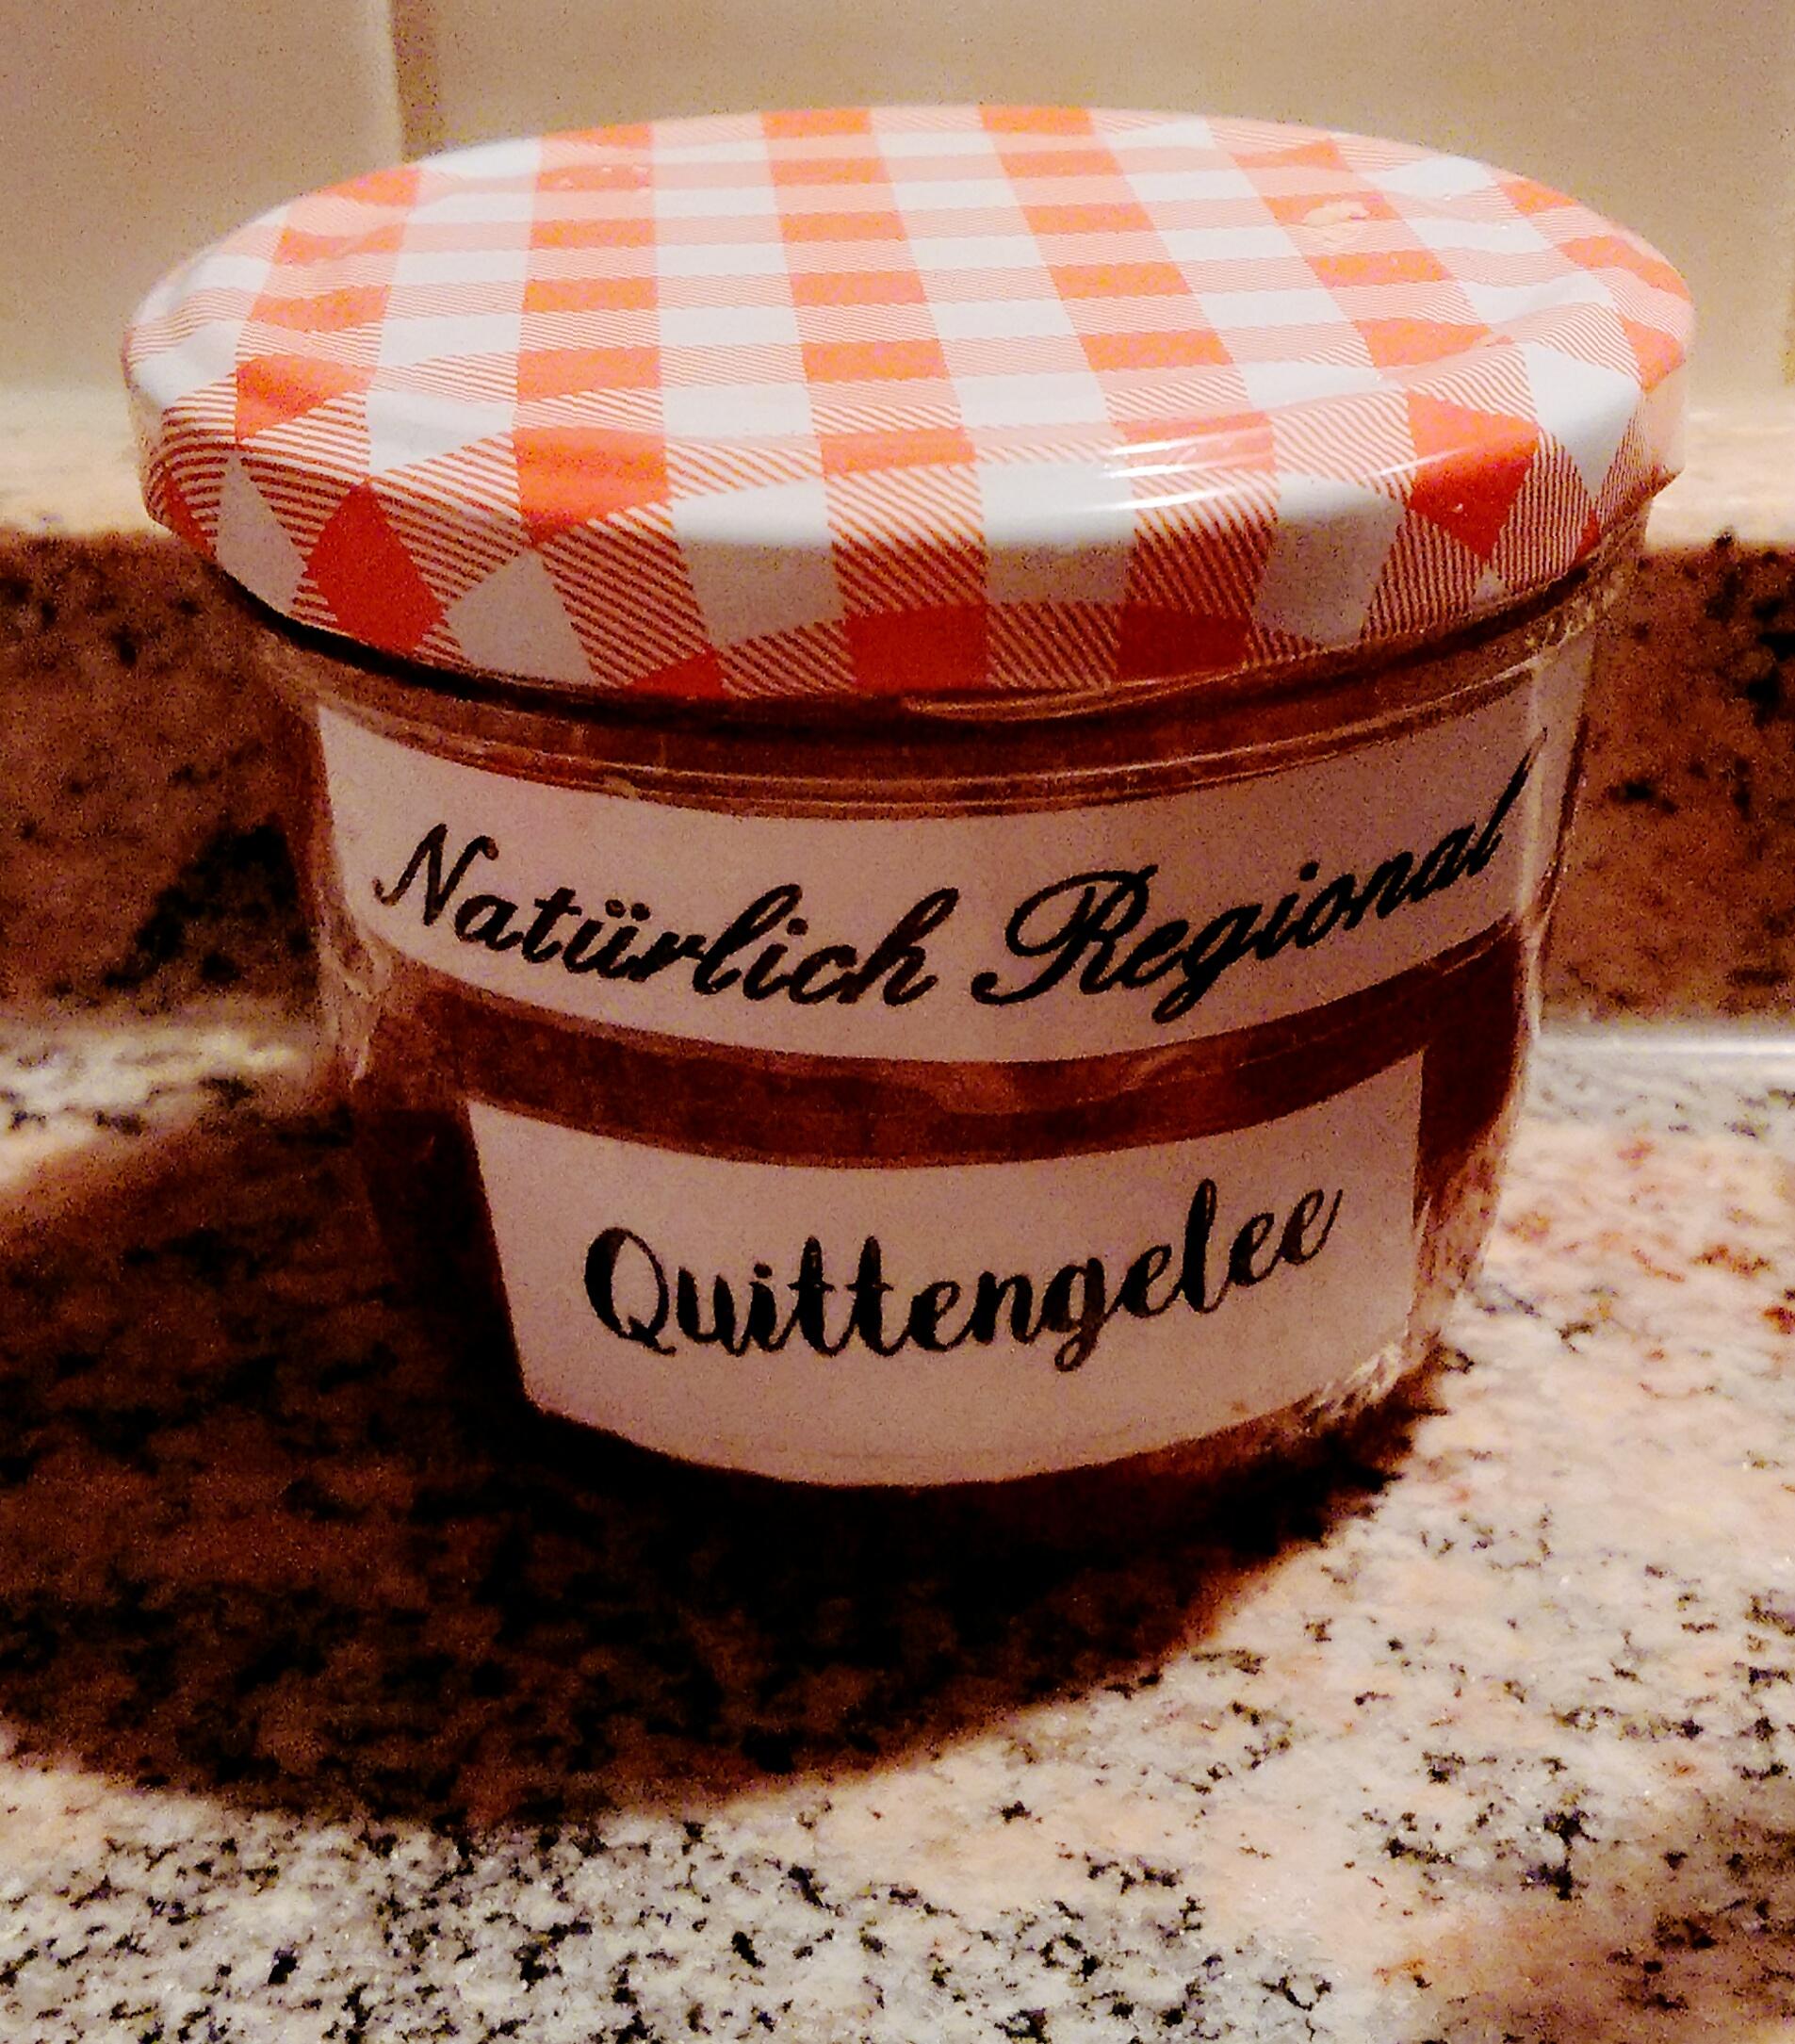 [Lokal Berlin] Gratis Quittengelee und Quittenkonfekt kosten